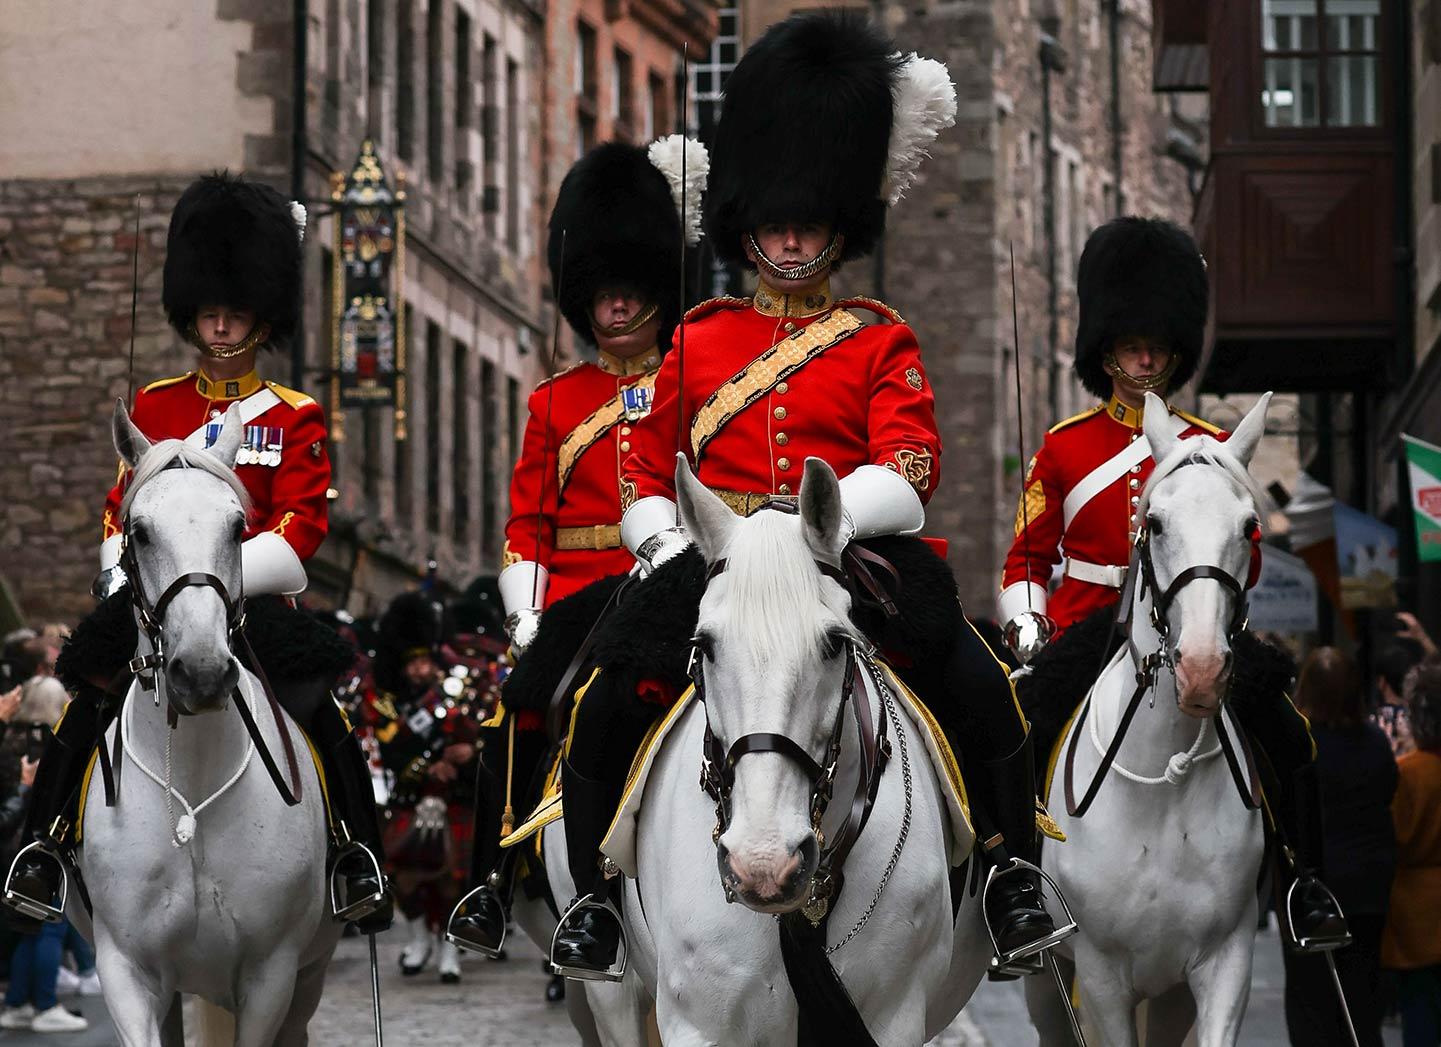 SCOTS DG parade through Edinburgh to celebrate 50 years